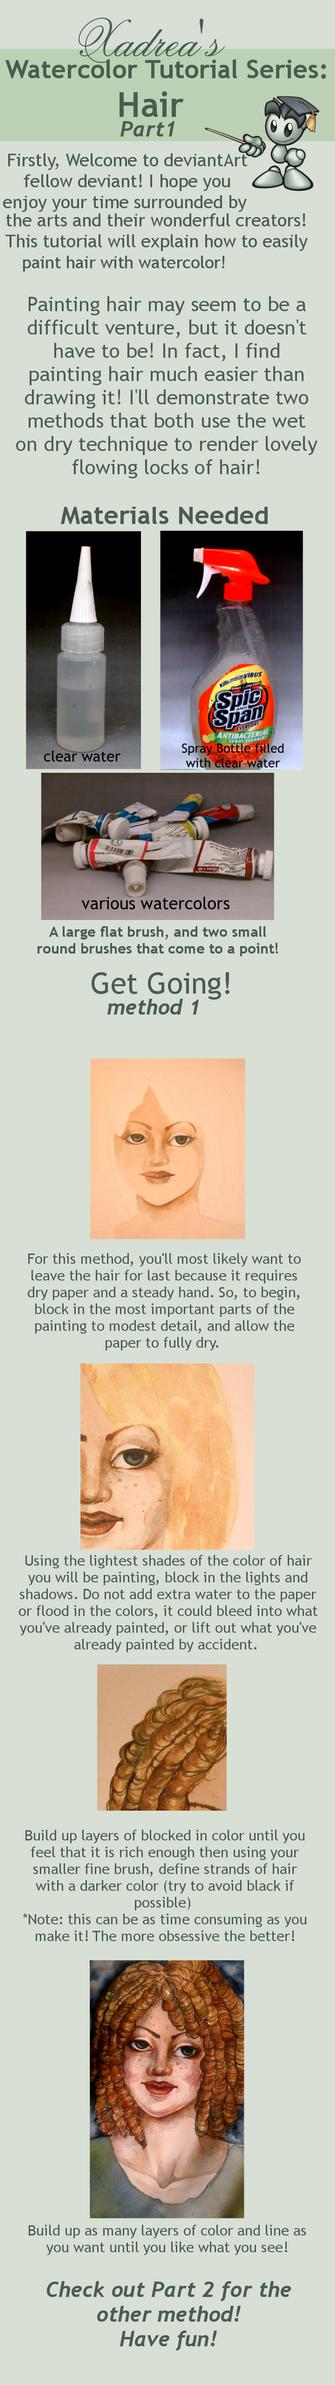 Watercolor Tutorial: Hair part 1 by Xadrea